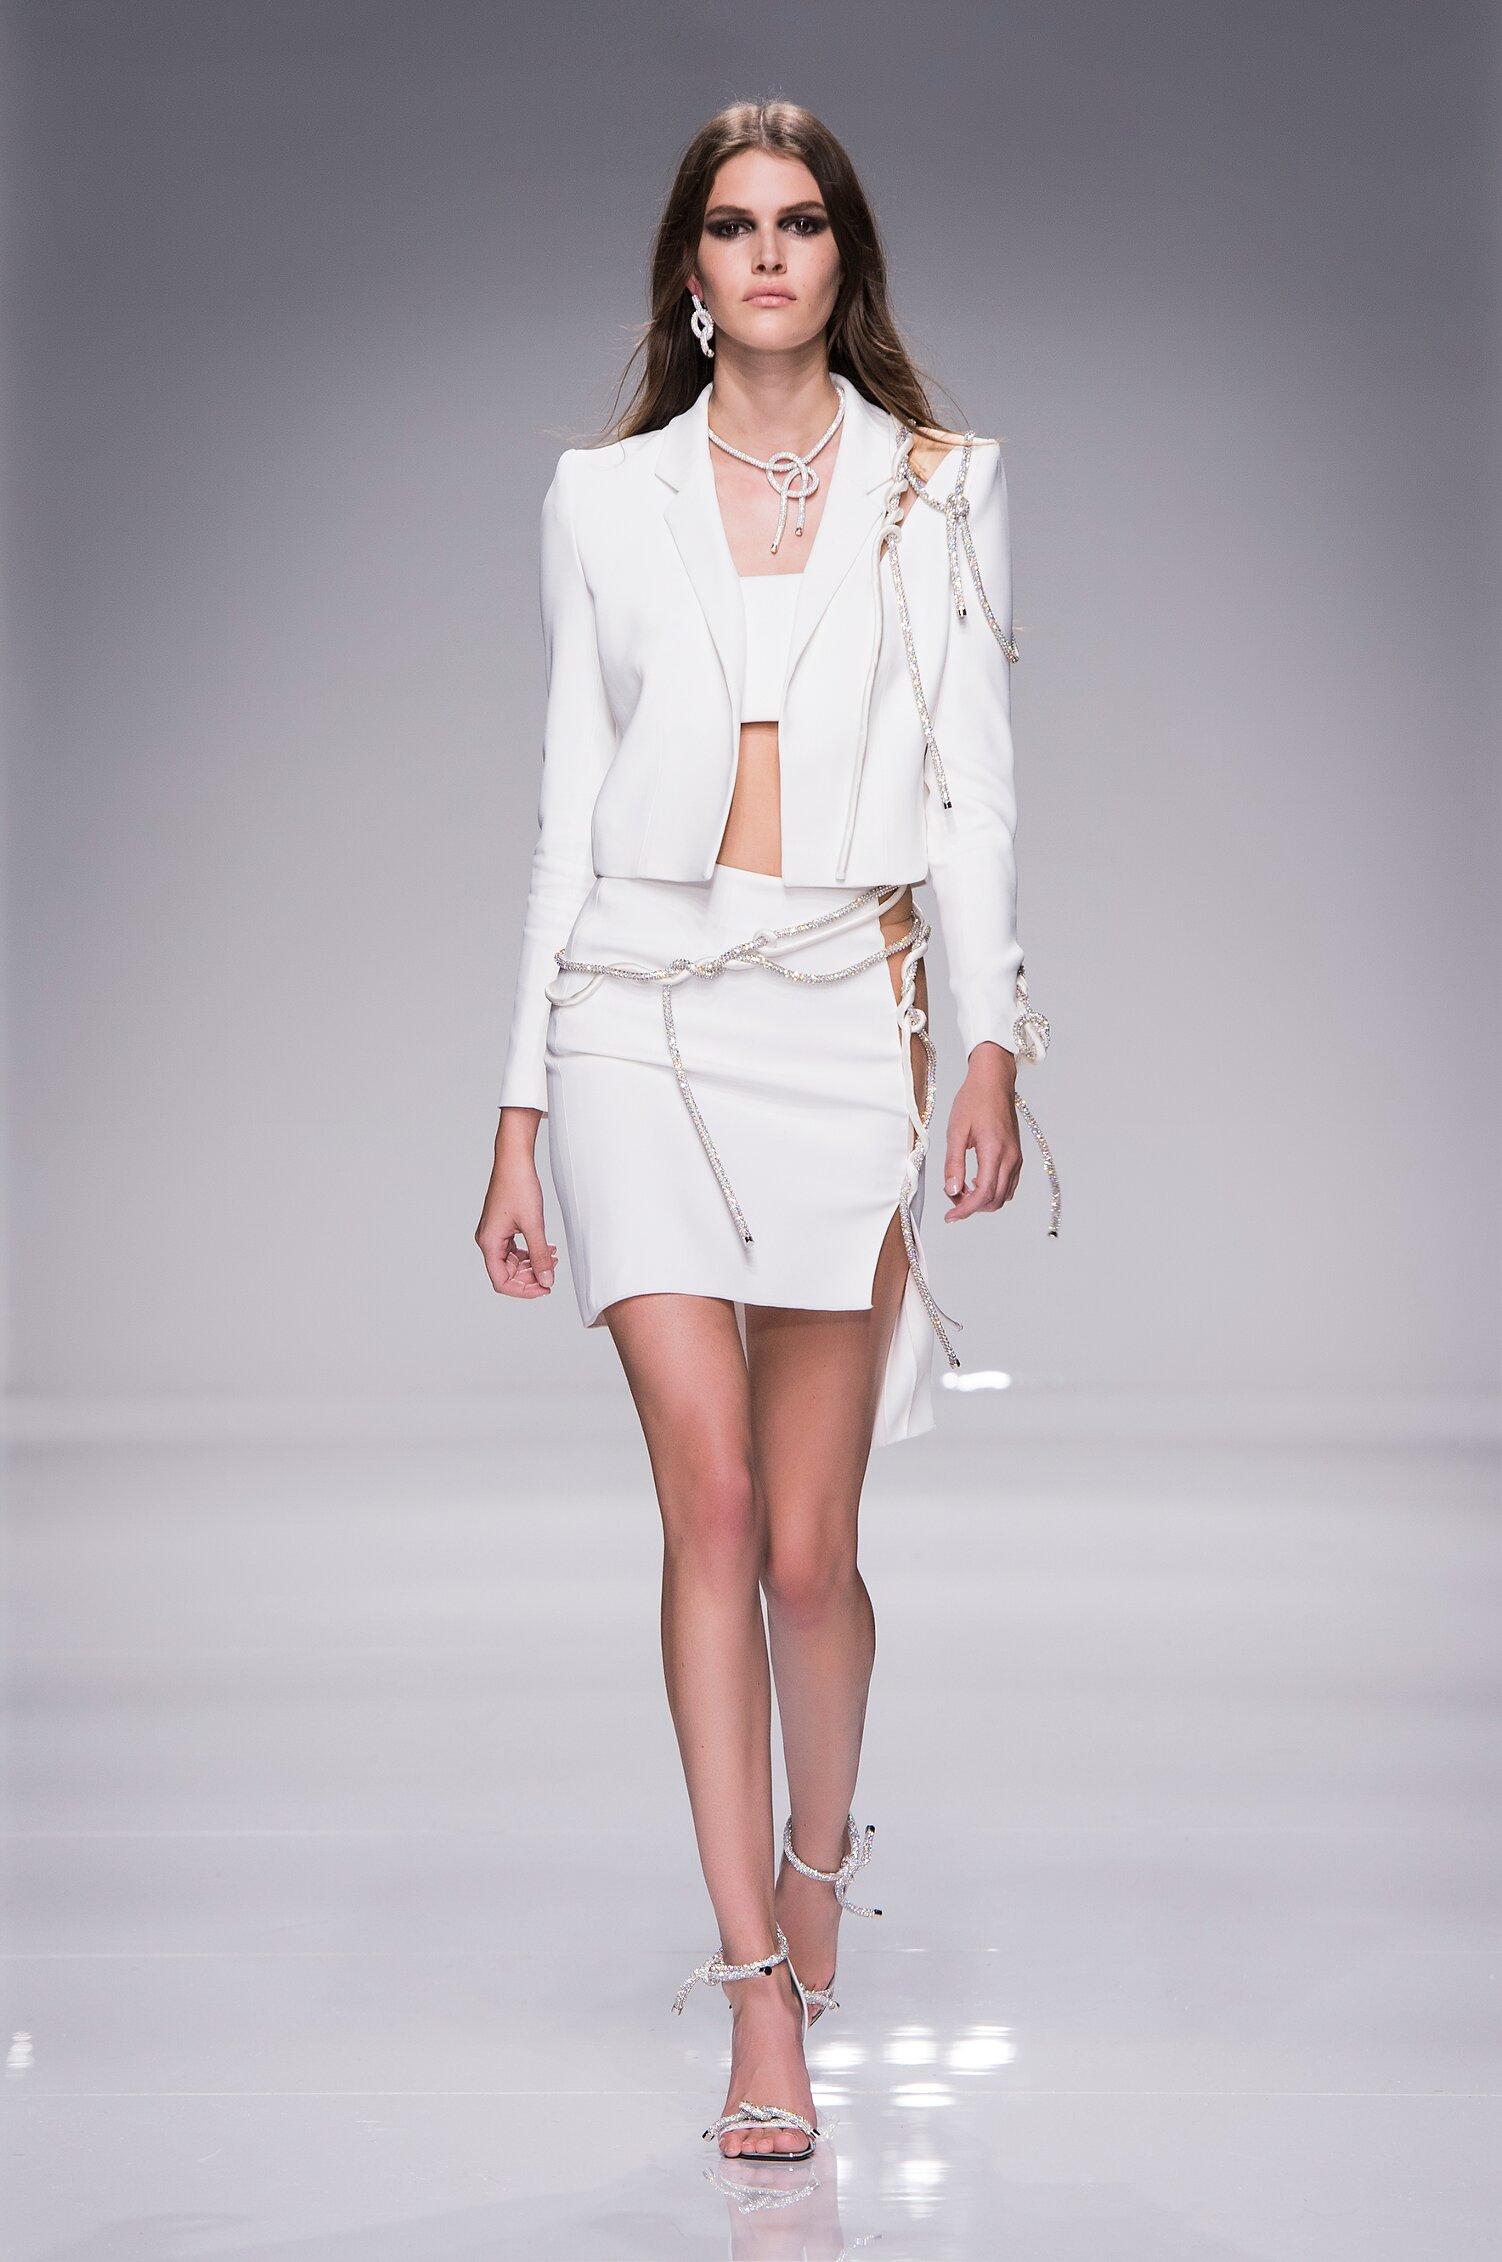 2016 Atelier Versace Couture Catwalk